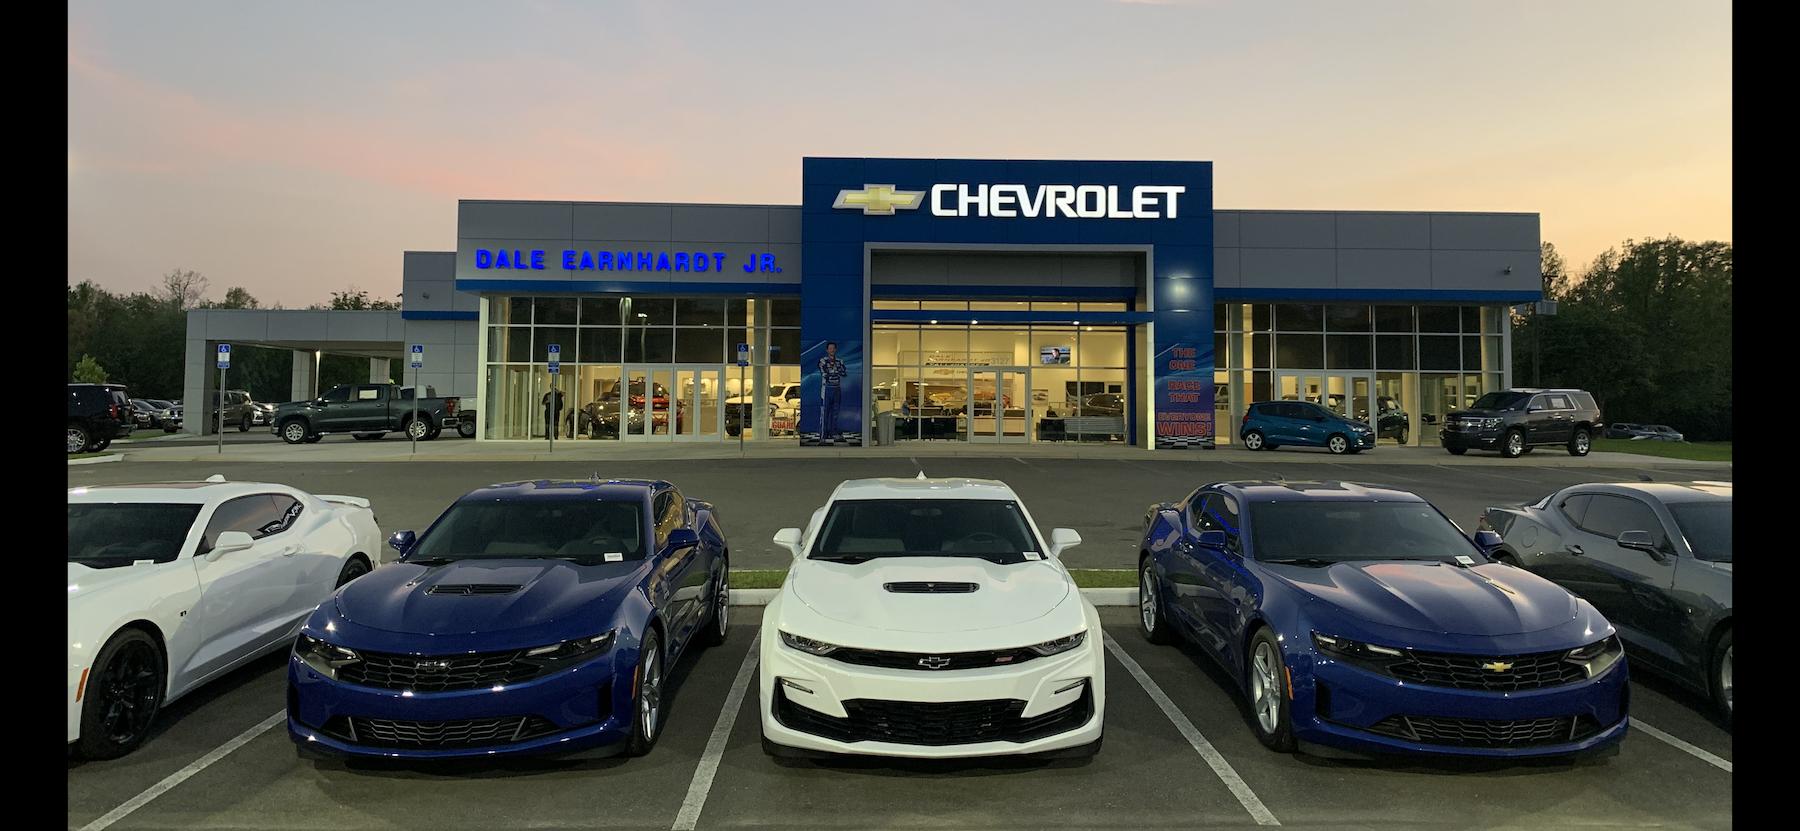 An exterior shot of Dale Earnhardt Jr Chevrolet